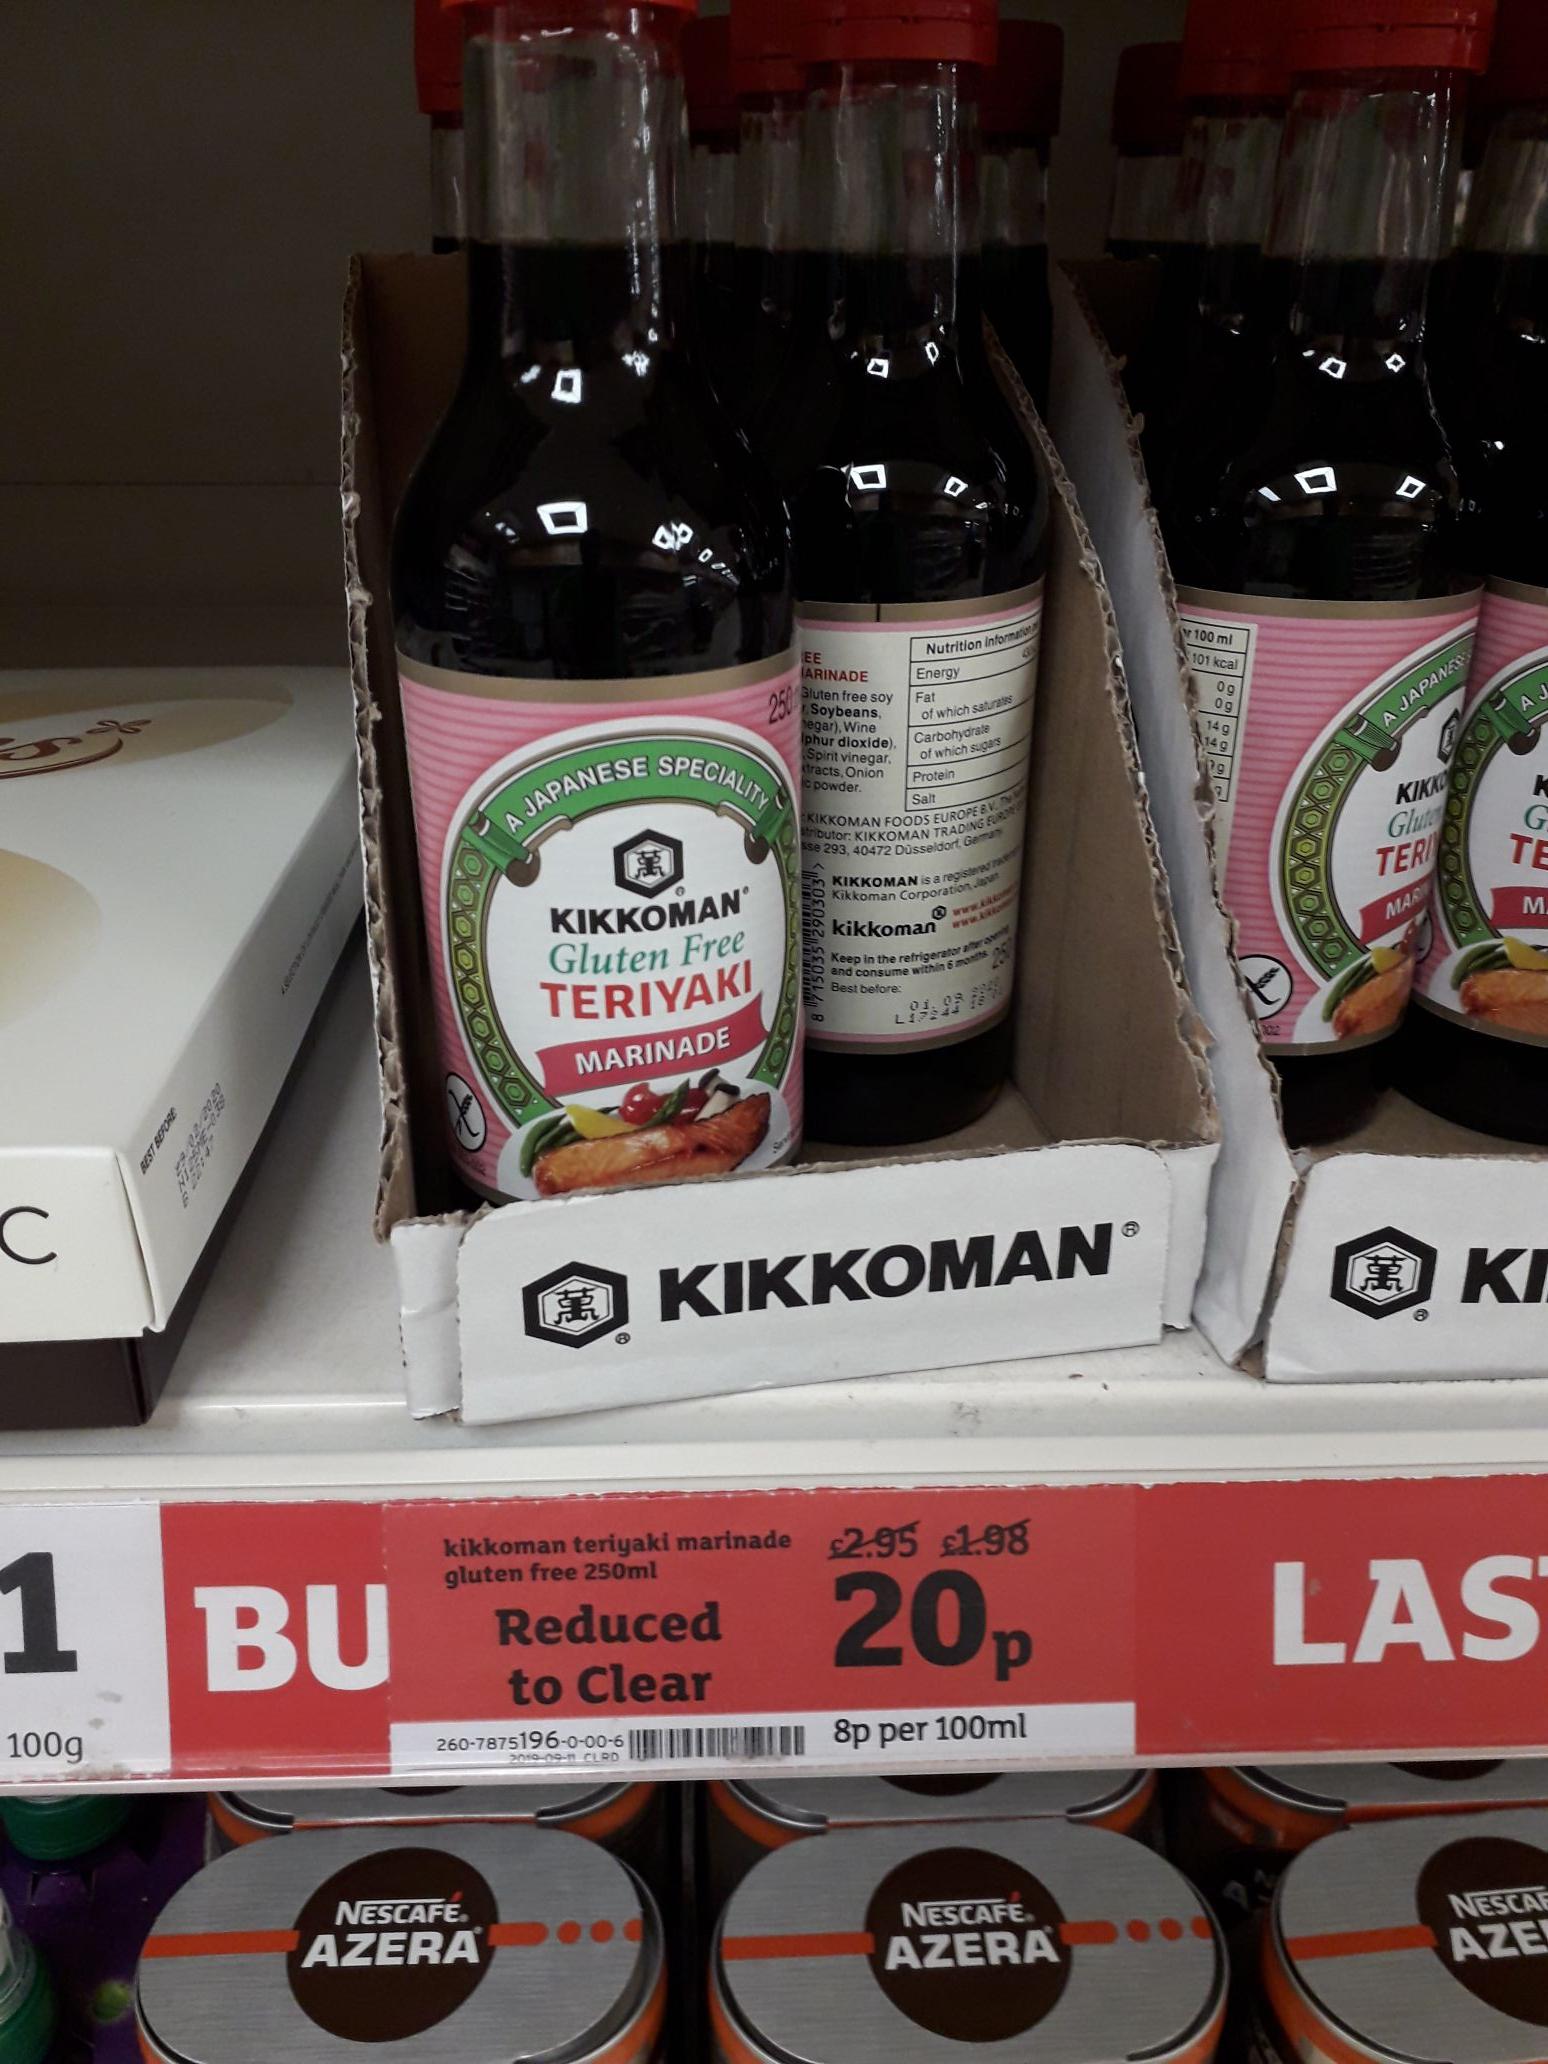 Kikkoman Gluten-Free Teriyaki Marinade - Reduced to Clear - 20p Instore at Sainsburys (Kirkcaldy)